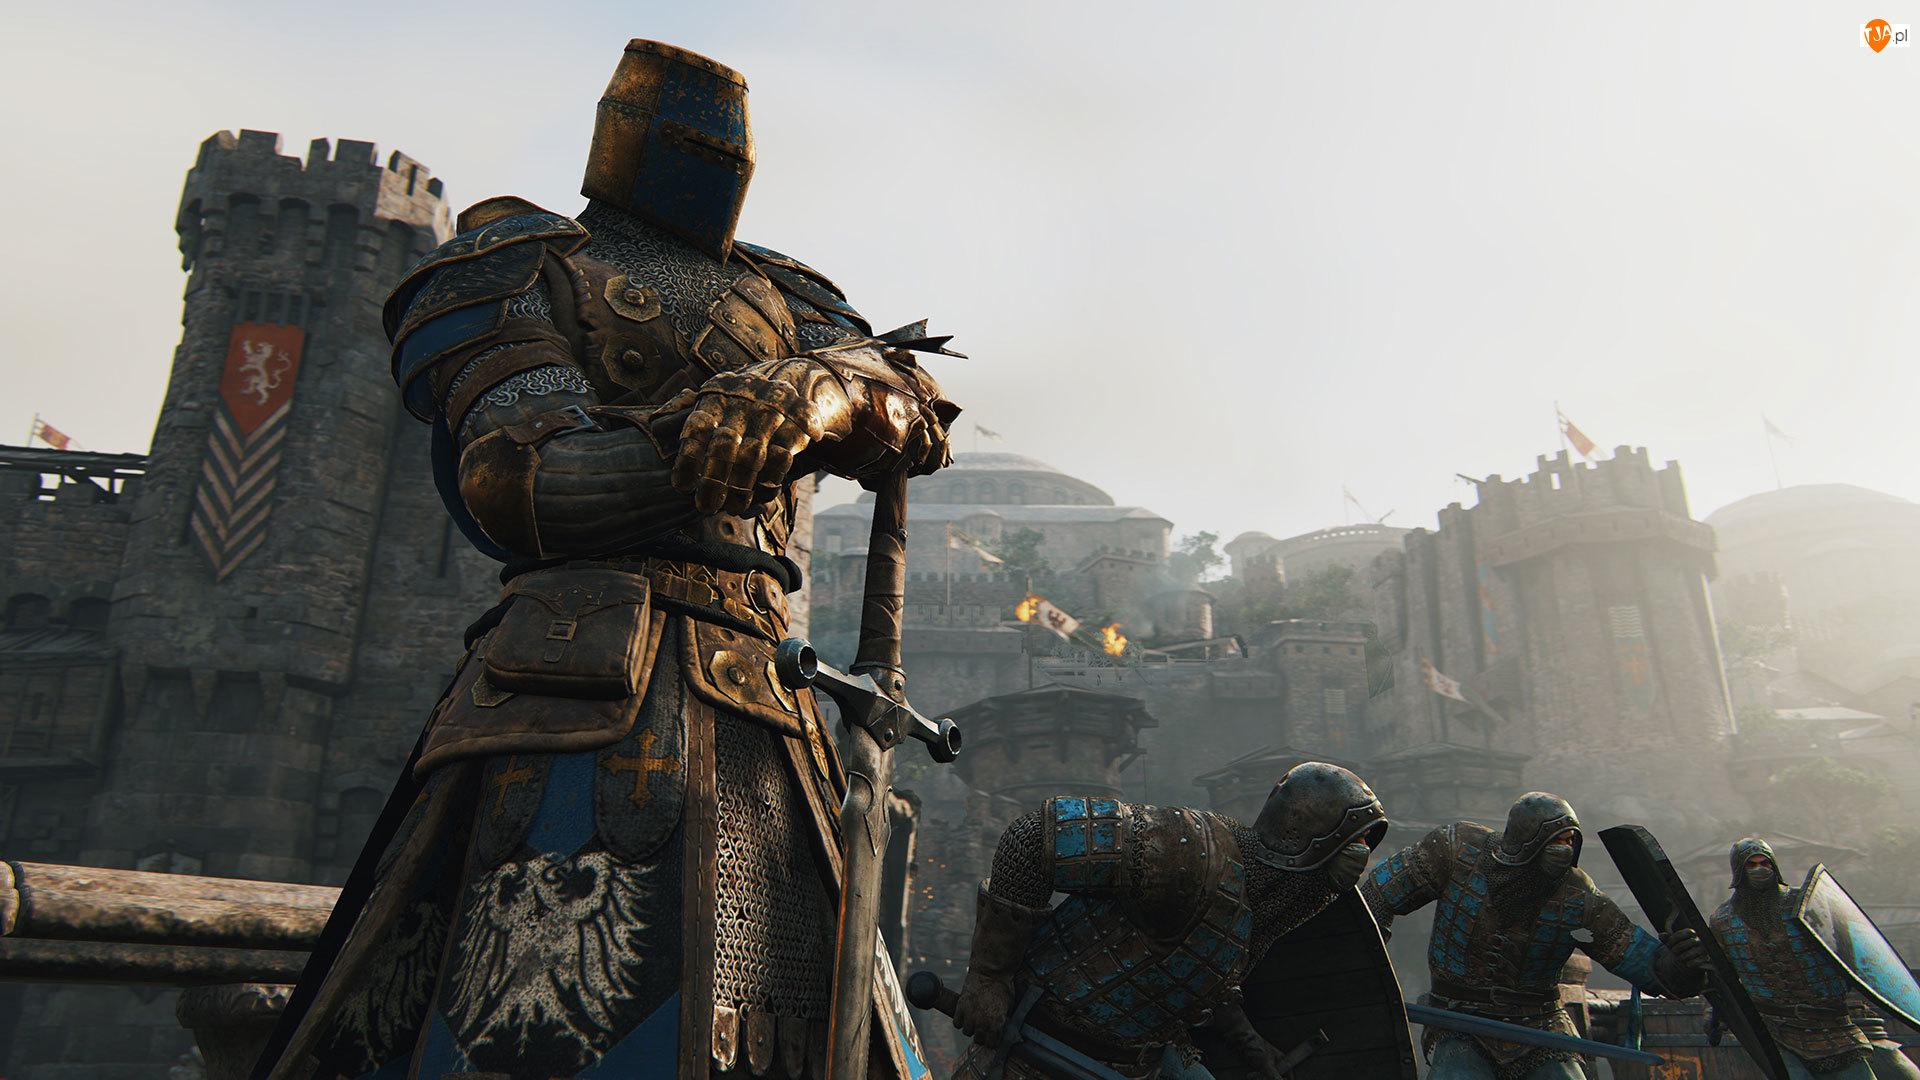 Gra, Rycerz, For Honor, Miecz